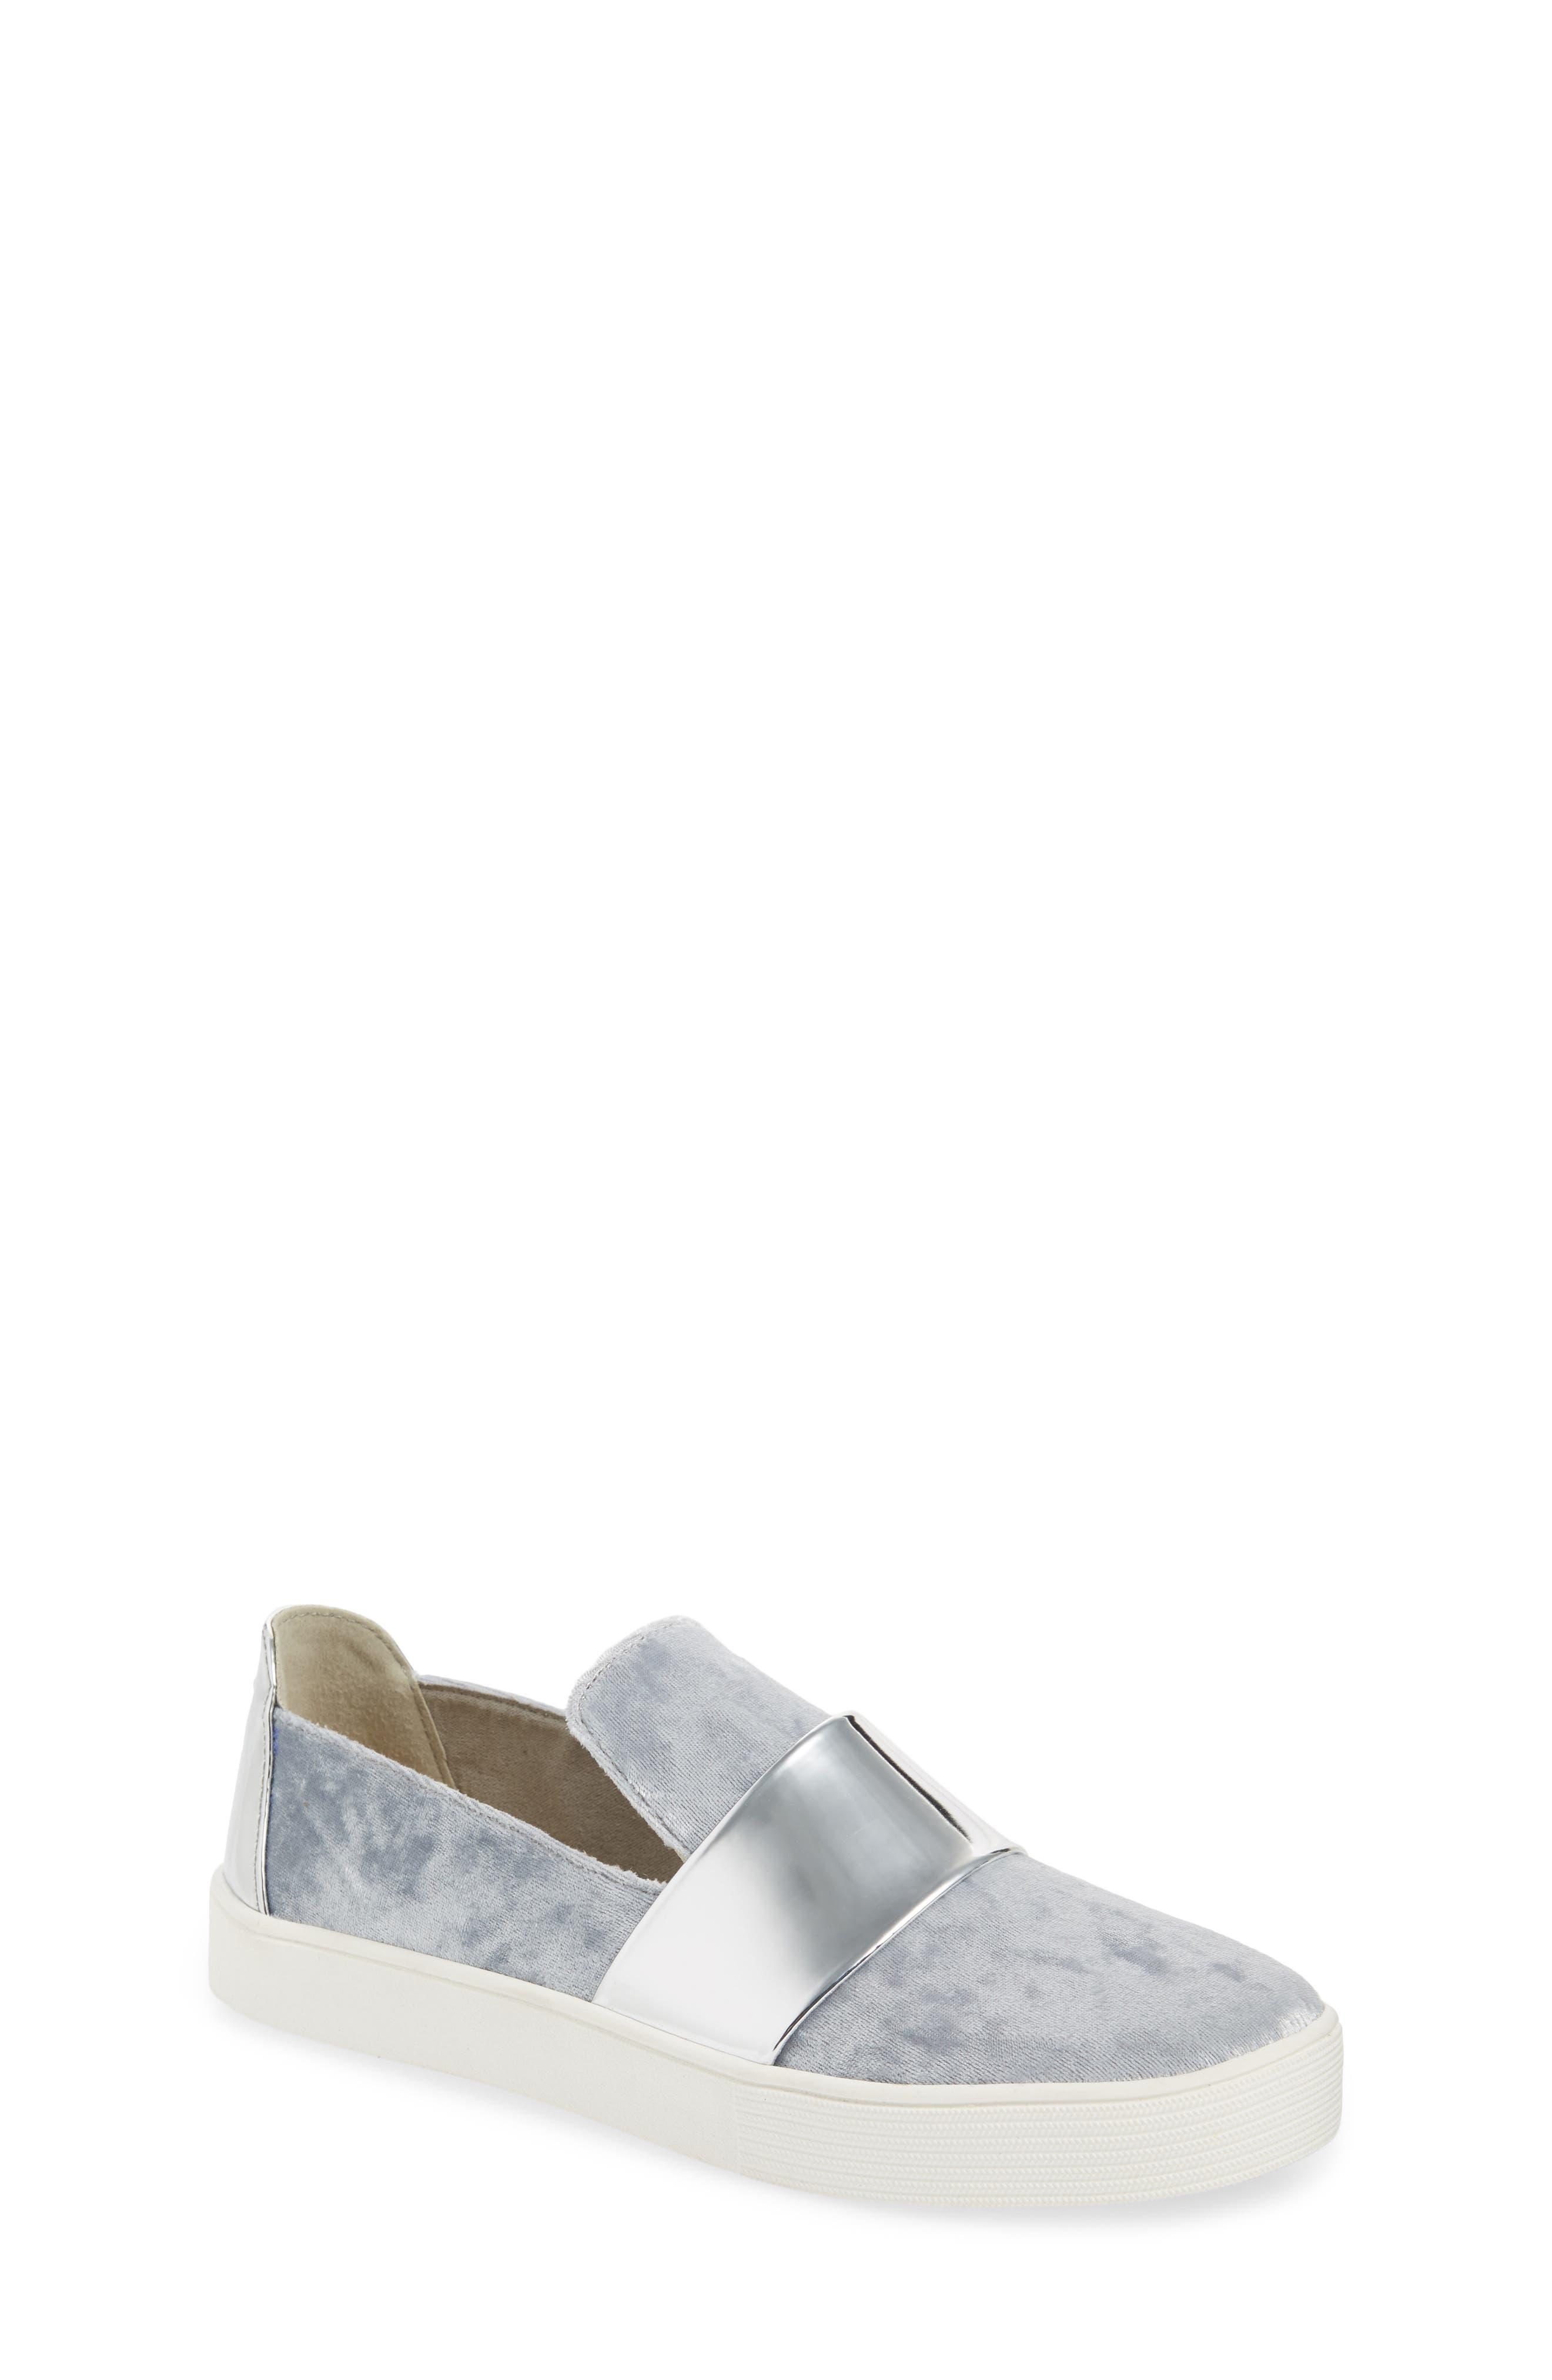 Vance Slip-On Sneaker,                         Main,                         color, Silver